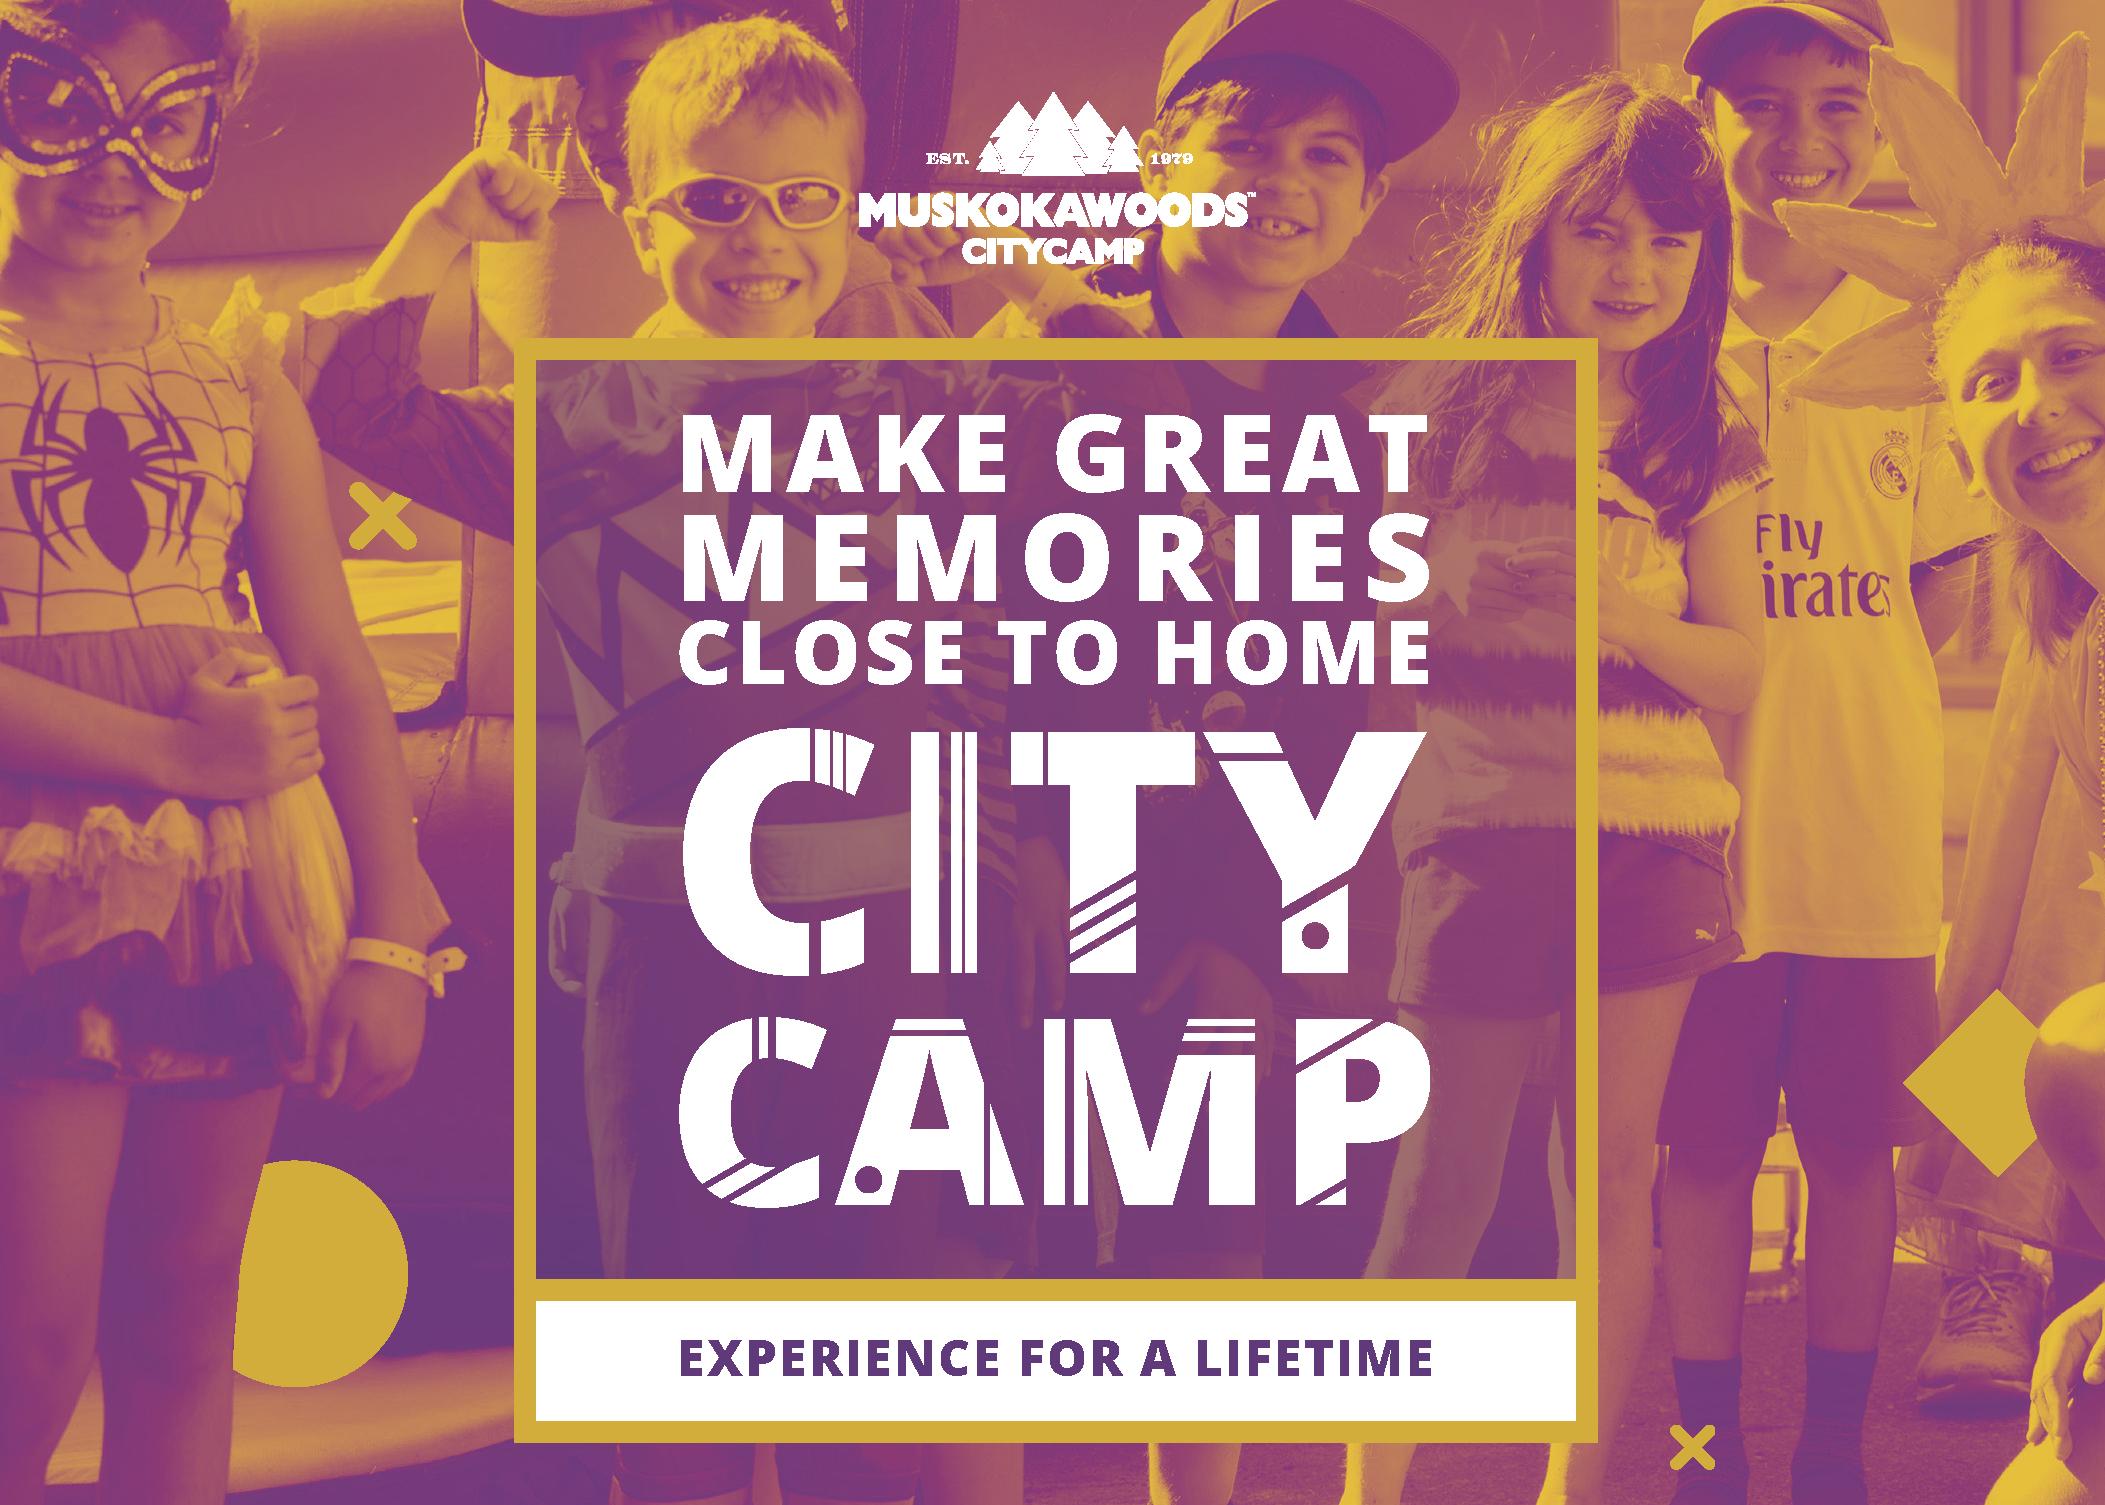 CITYCAMP -postcard-final-5x7-PRINT-front.png